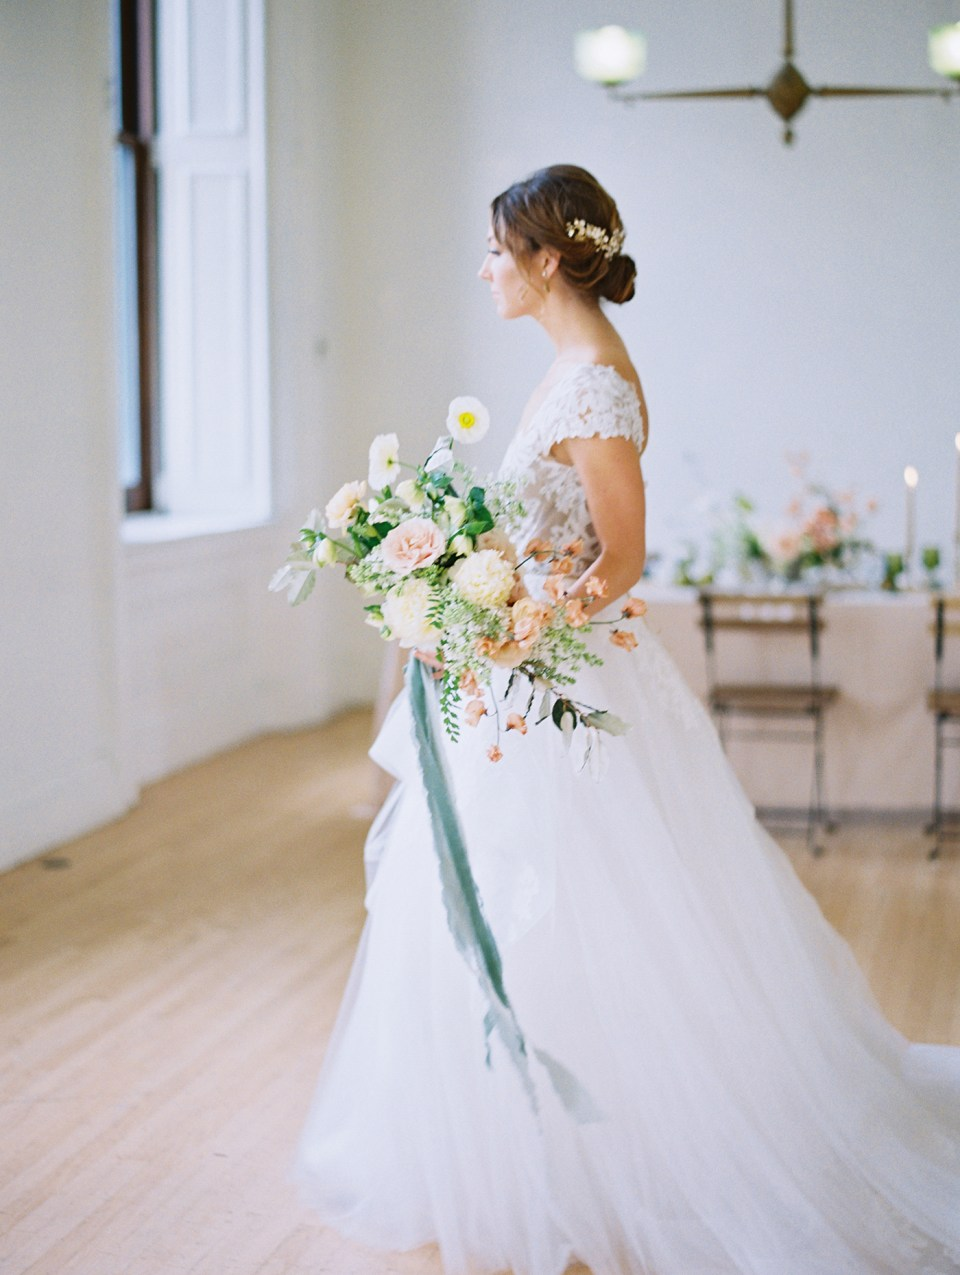 Custom Wedding Stationery Designer - Sarah Ann Design - Emerald and Jade